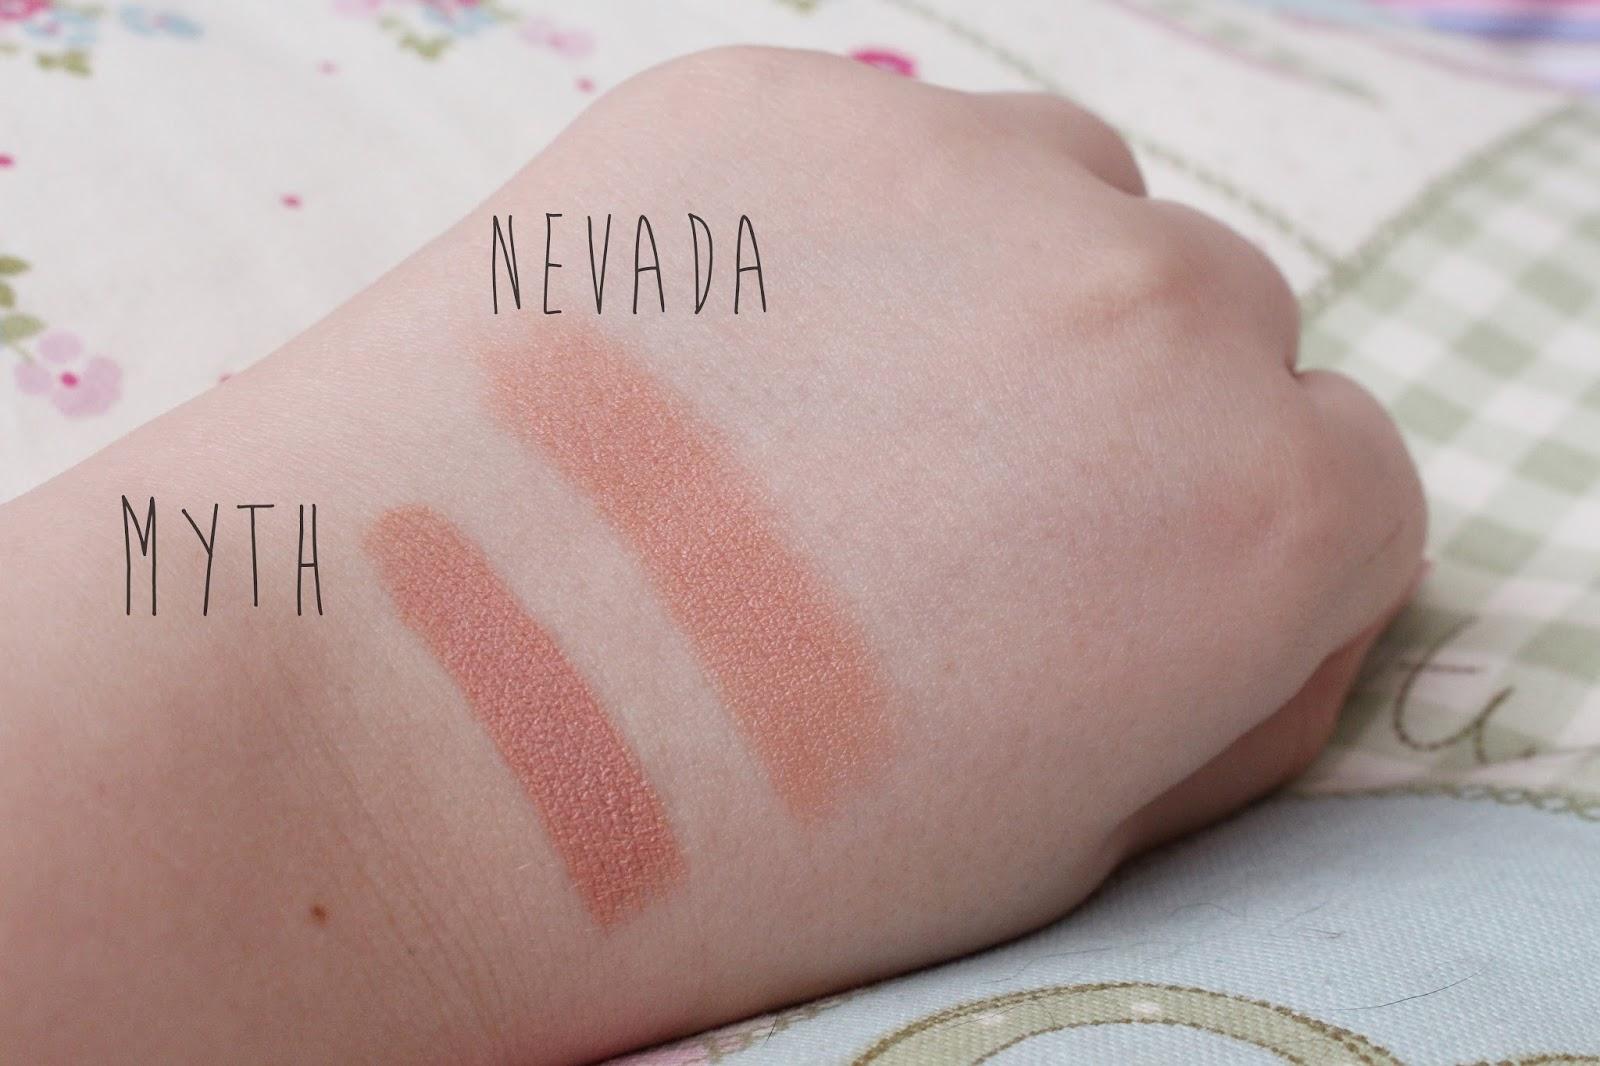 Topshop Nevada Lipstick and MAC Myth Lipstick